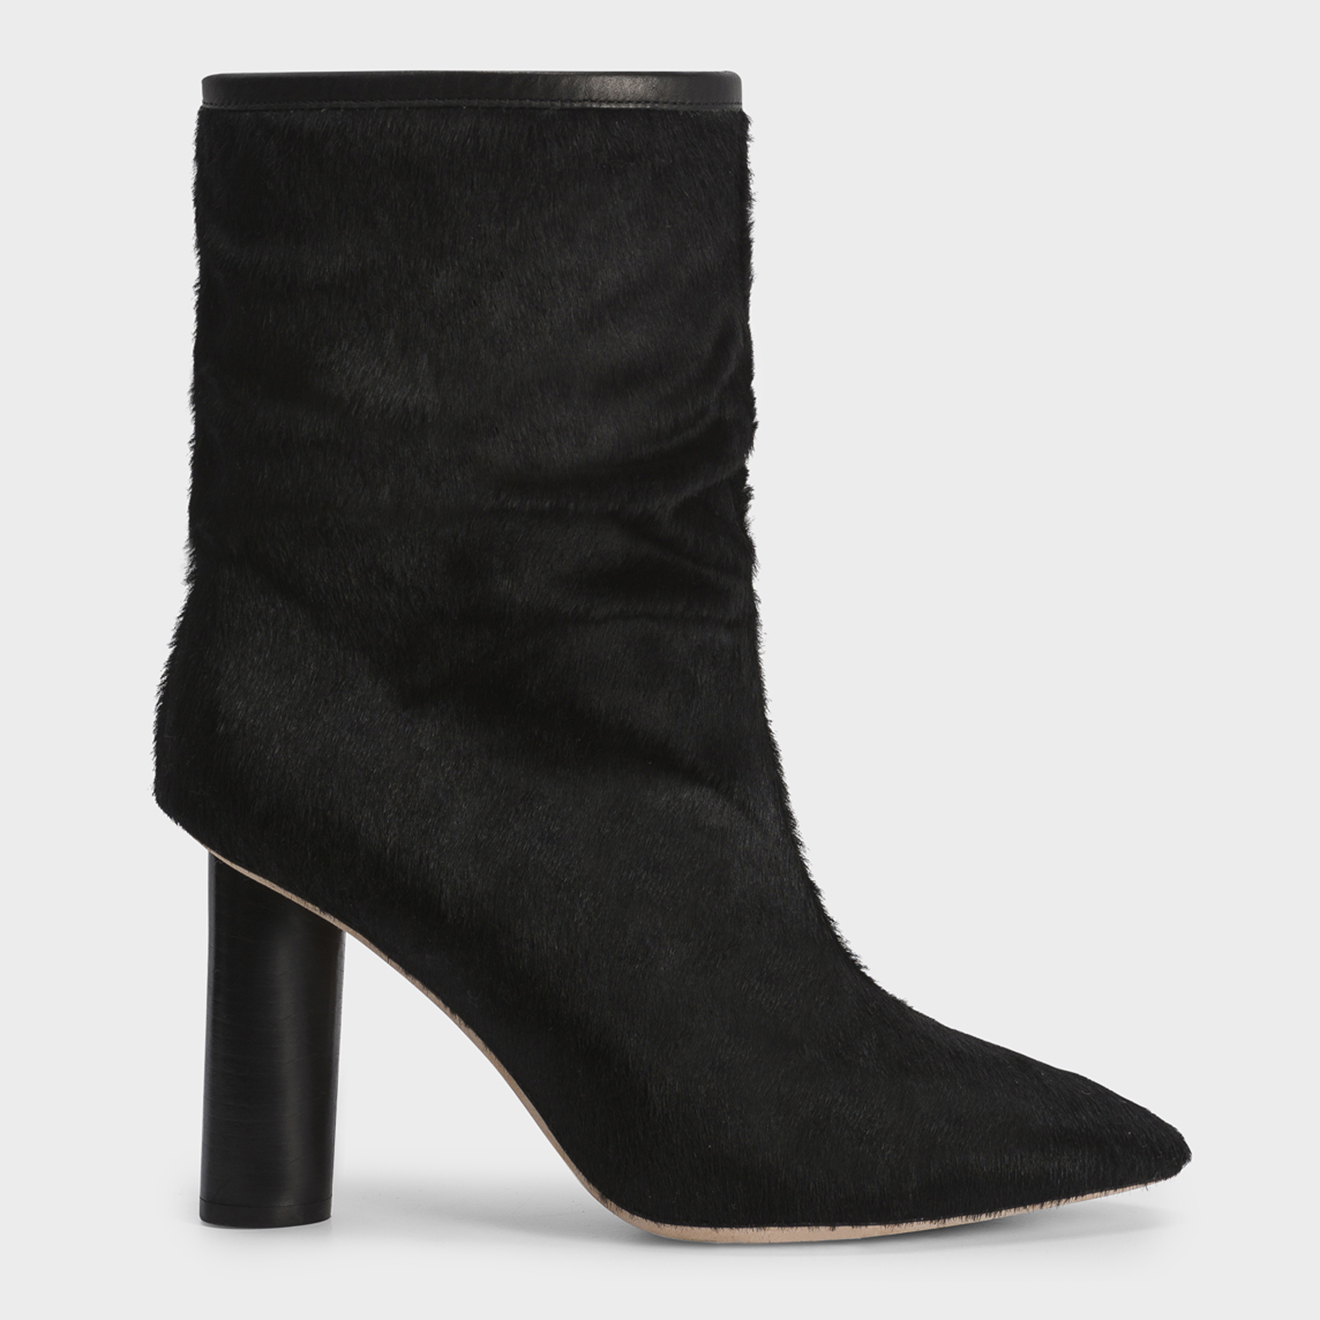 Boots en Cuir de Veau Sokany noires - Talon 8 cm - Iro - Modalova